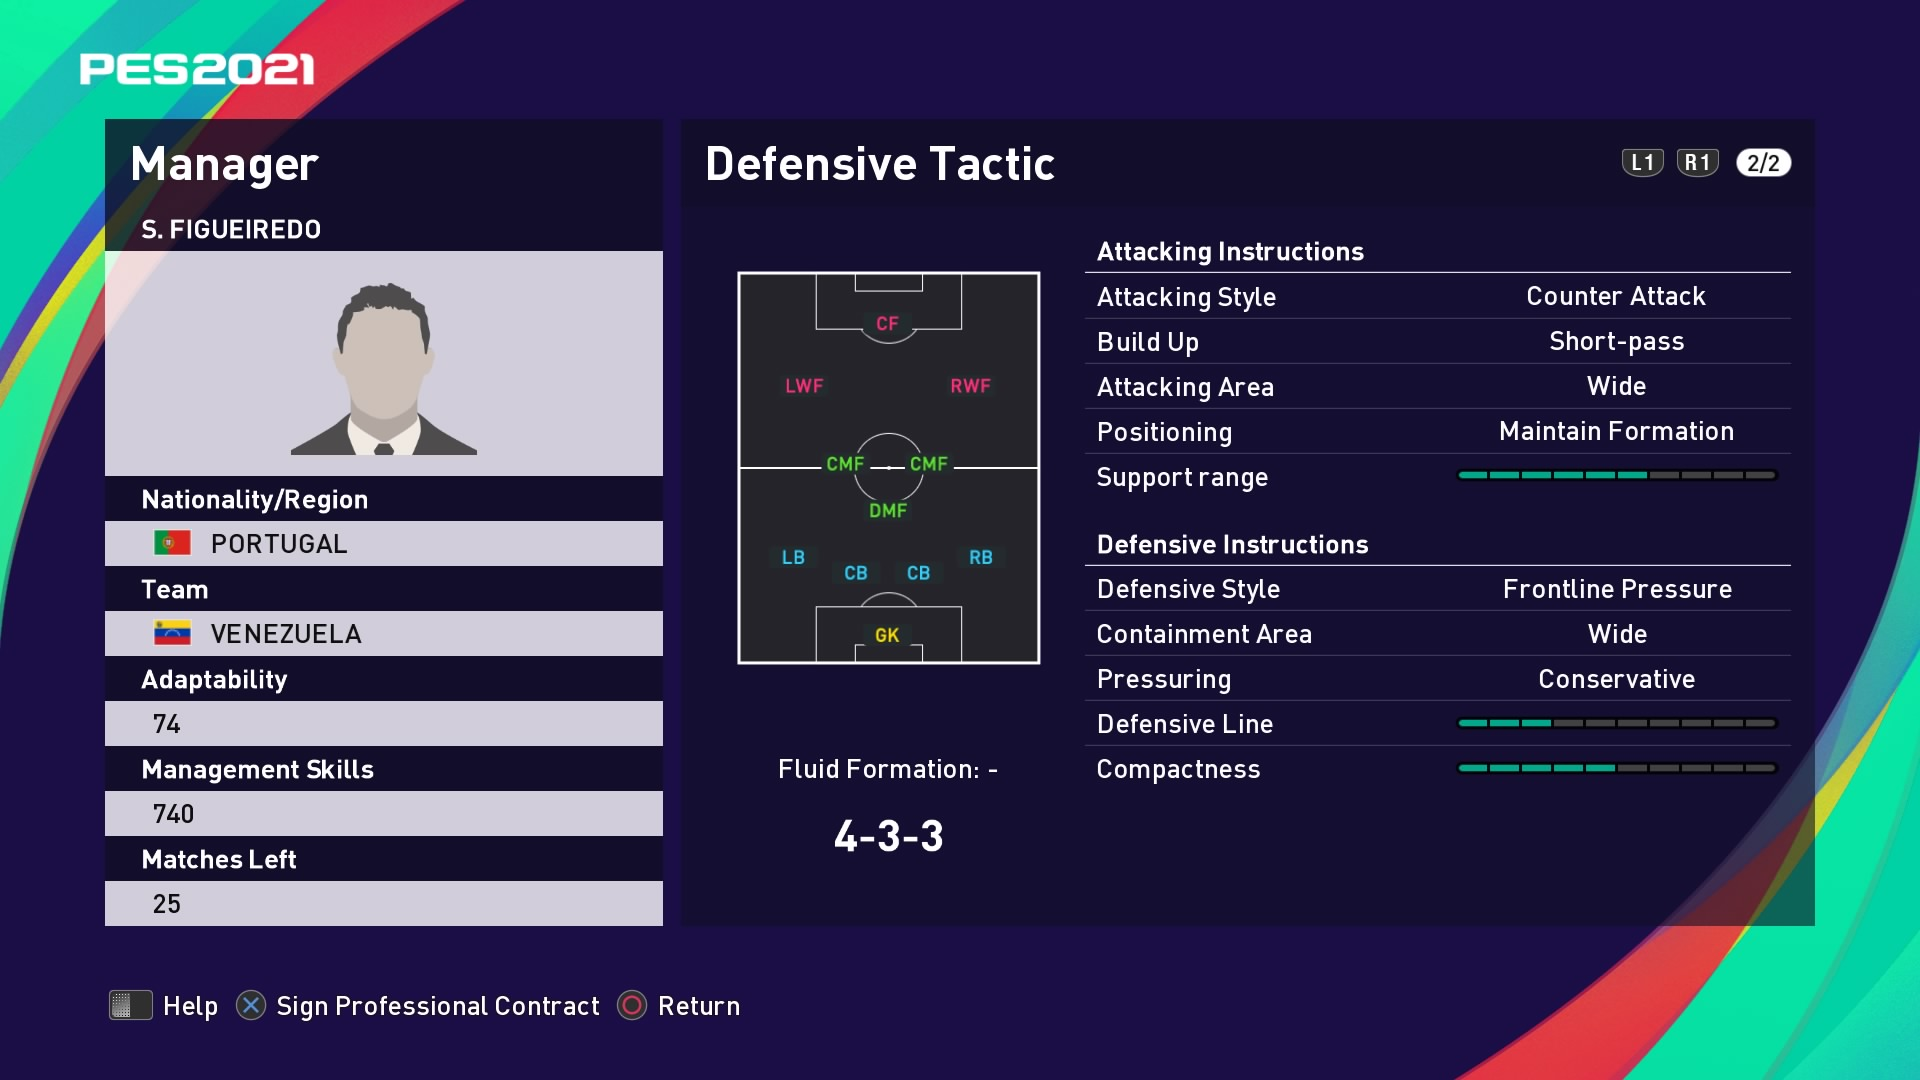 S. Figueiredo (José Peseiro) Defensive Tactic in PES 2021 myClub